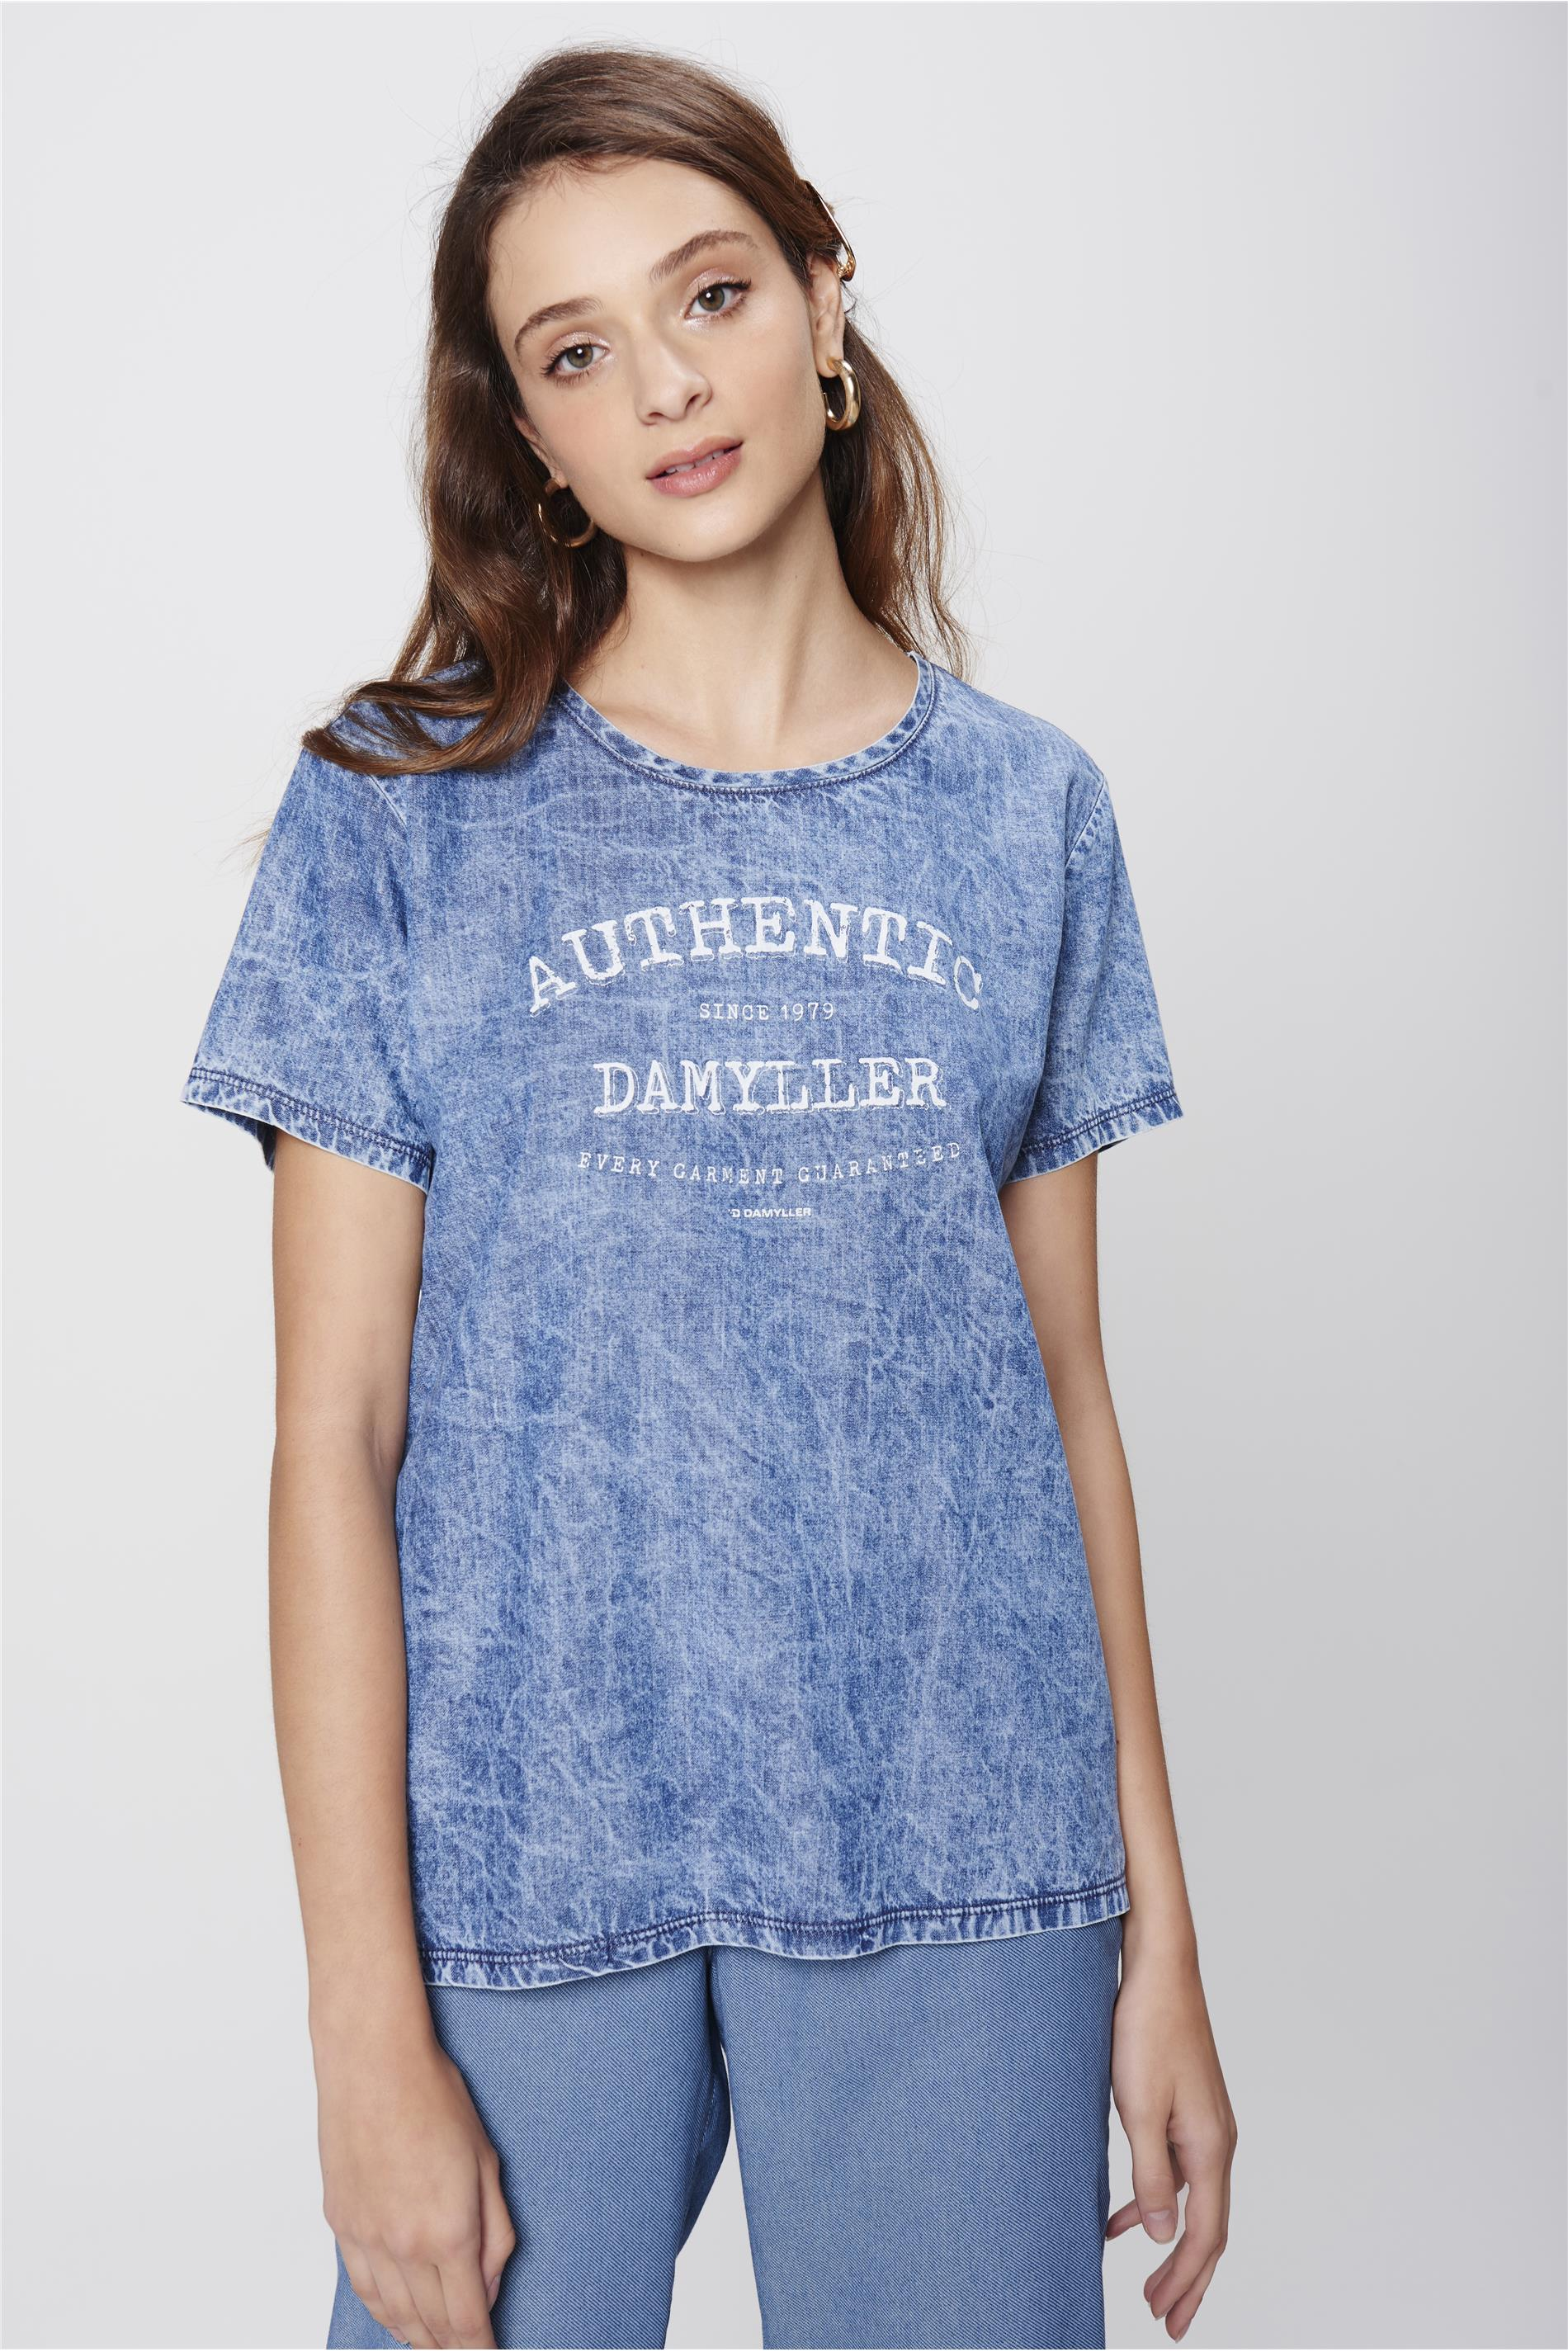 58fc67c05 Damyller · Moda Feminina · Blusas · Camiseta. abrir